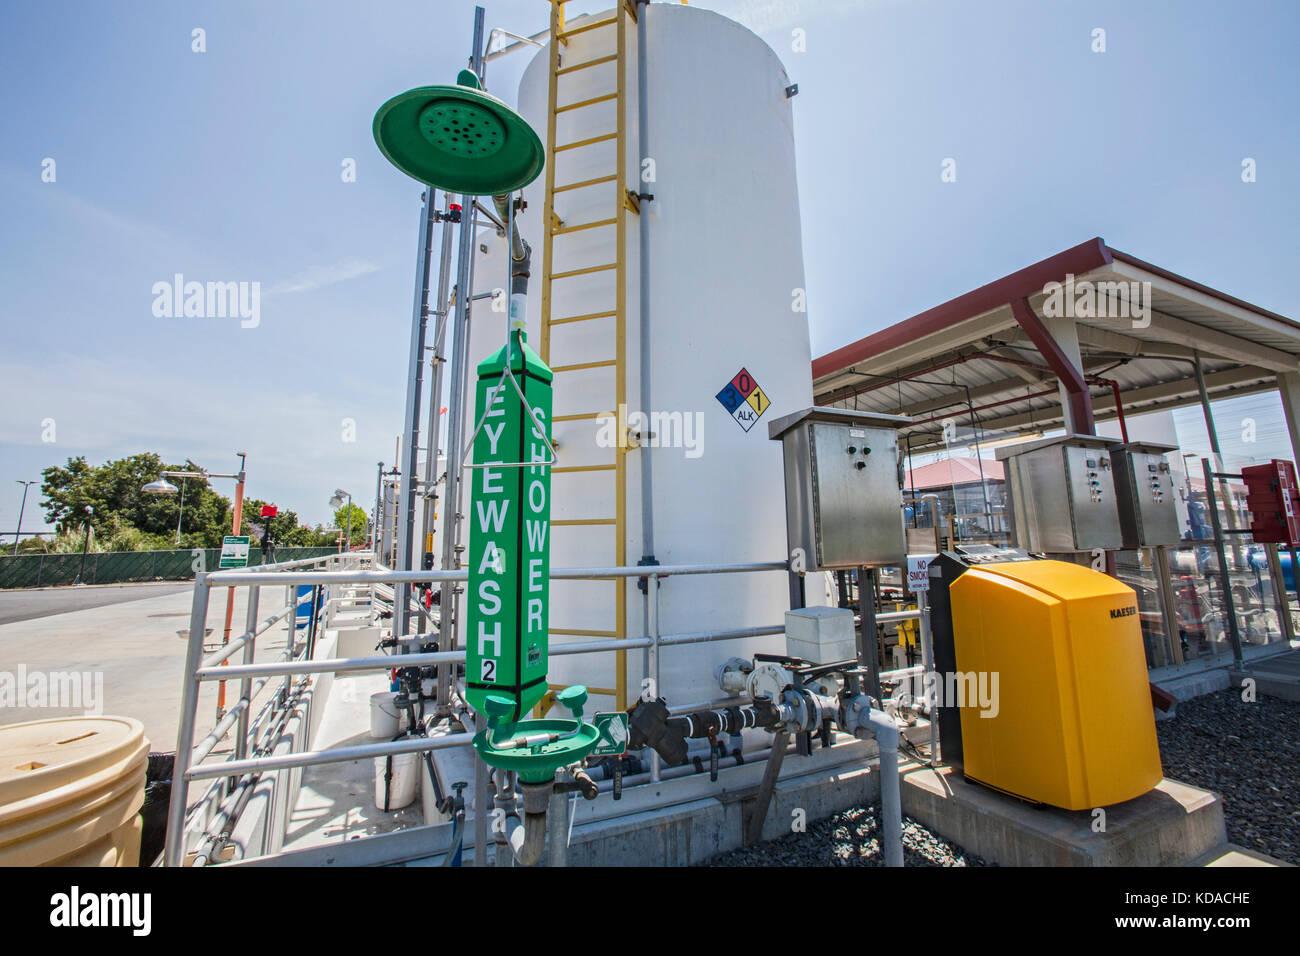 Long Beach Water Replenishment District